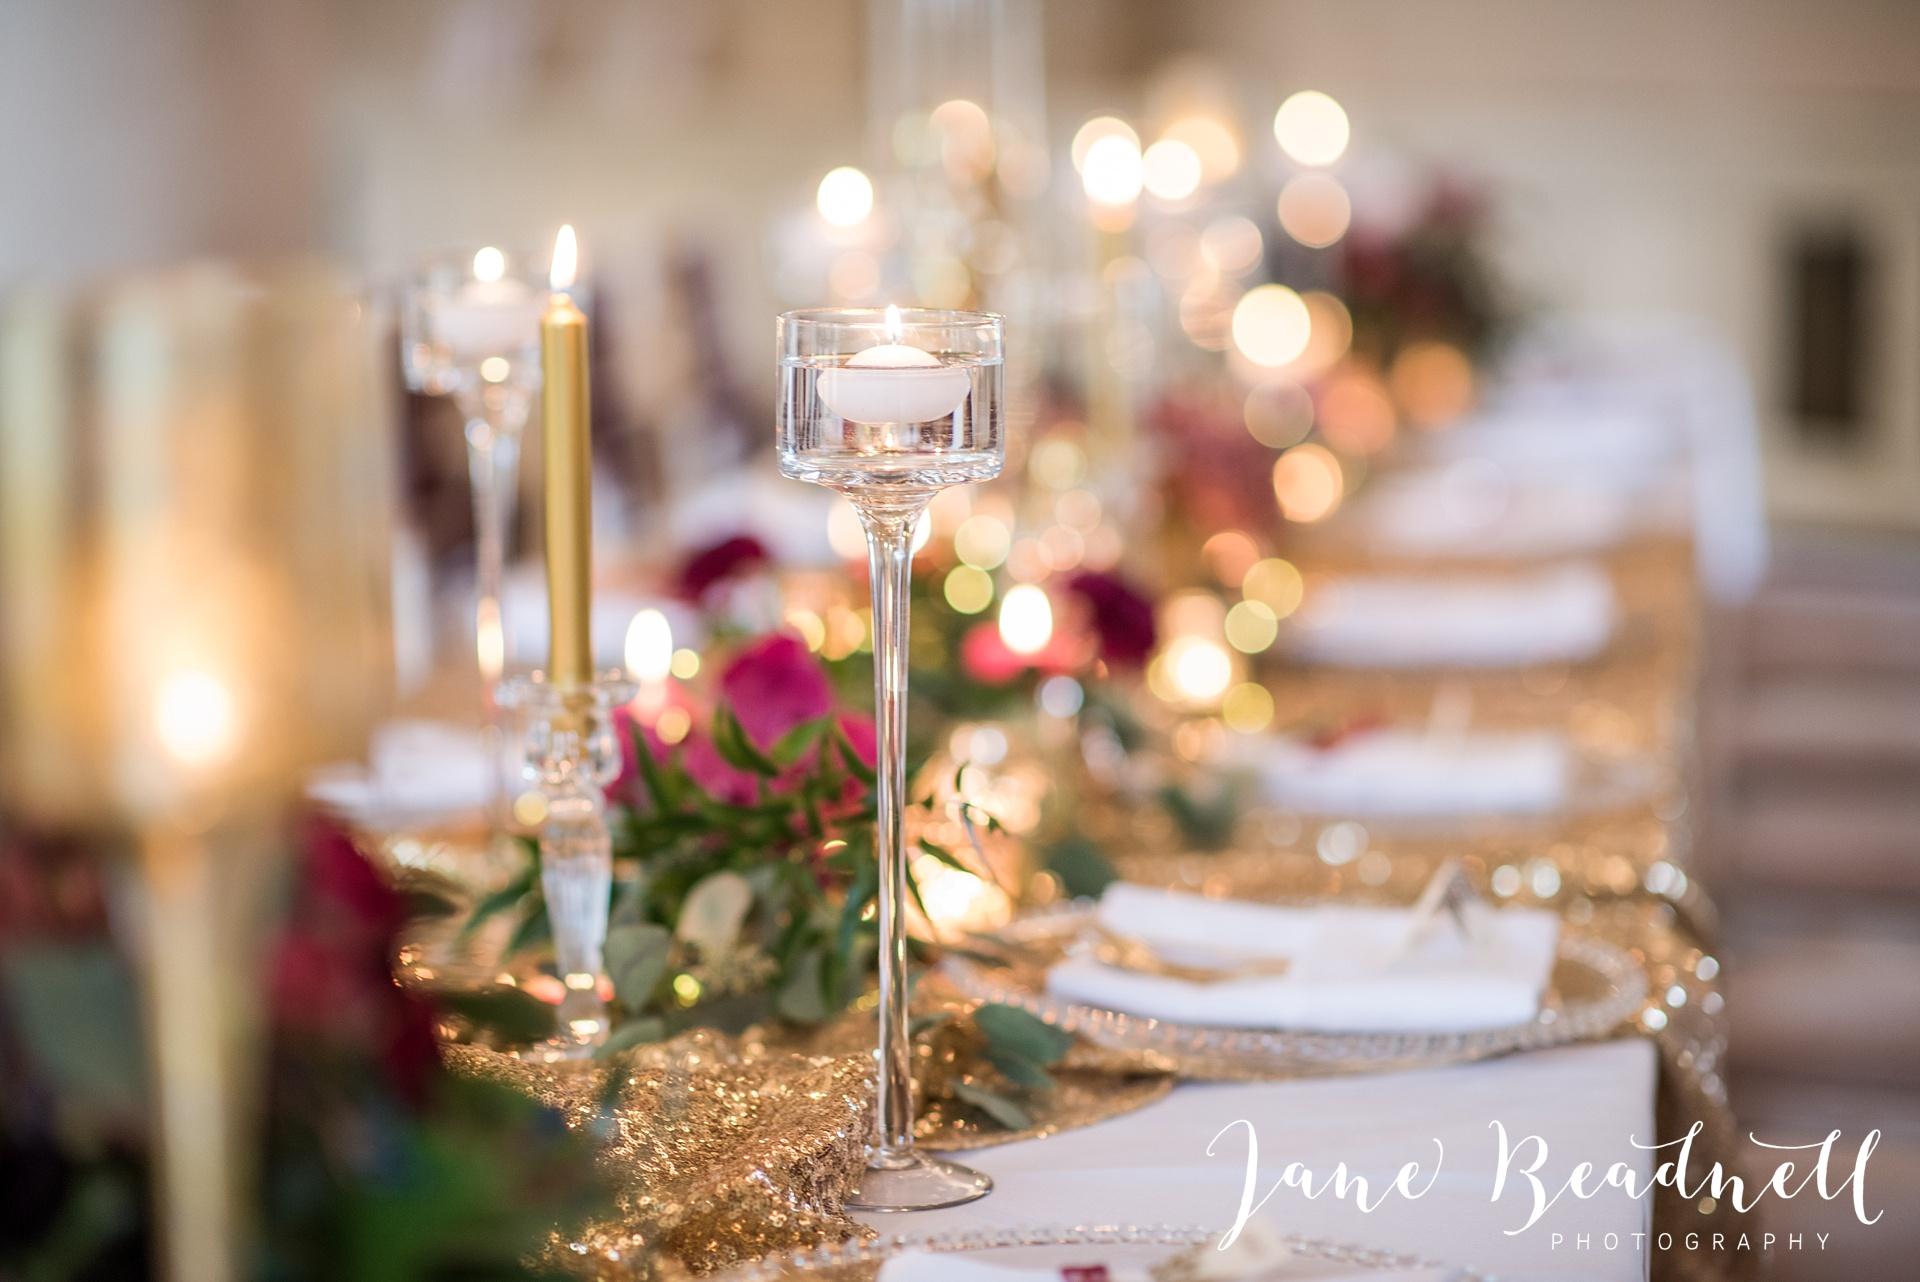 The-Orangery-Gold-Glam-photoshoot-by-Jane-Beadnell-Photography-York_0008.jpg